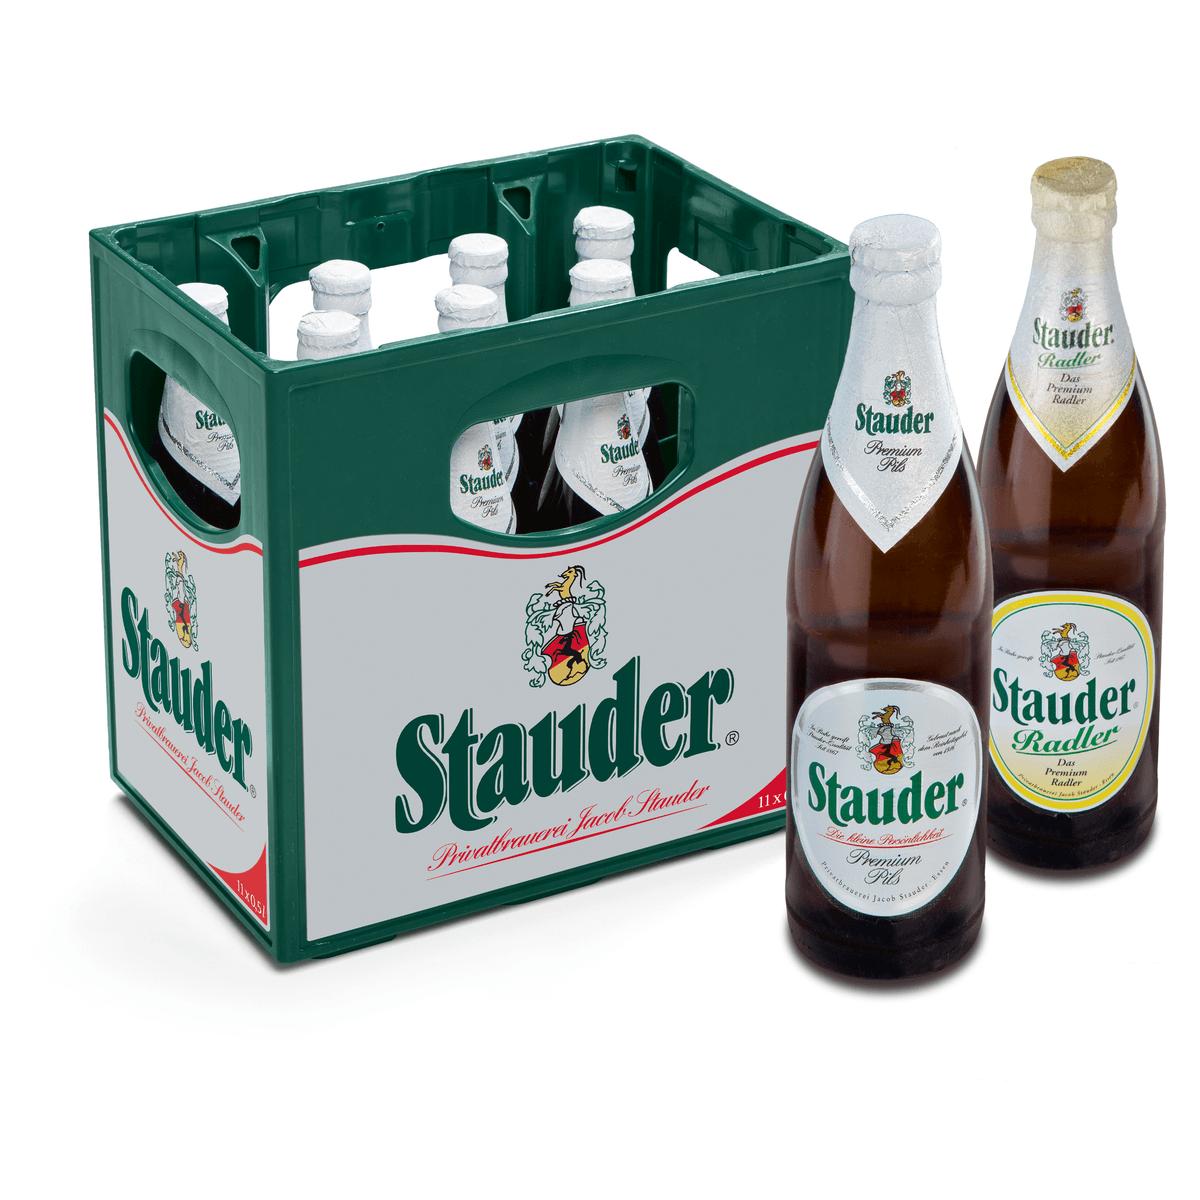 Stauder Radler 11 x 0,5L | Biermixgetränke | Bier | Sortiment | Trinkgut